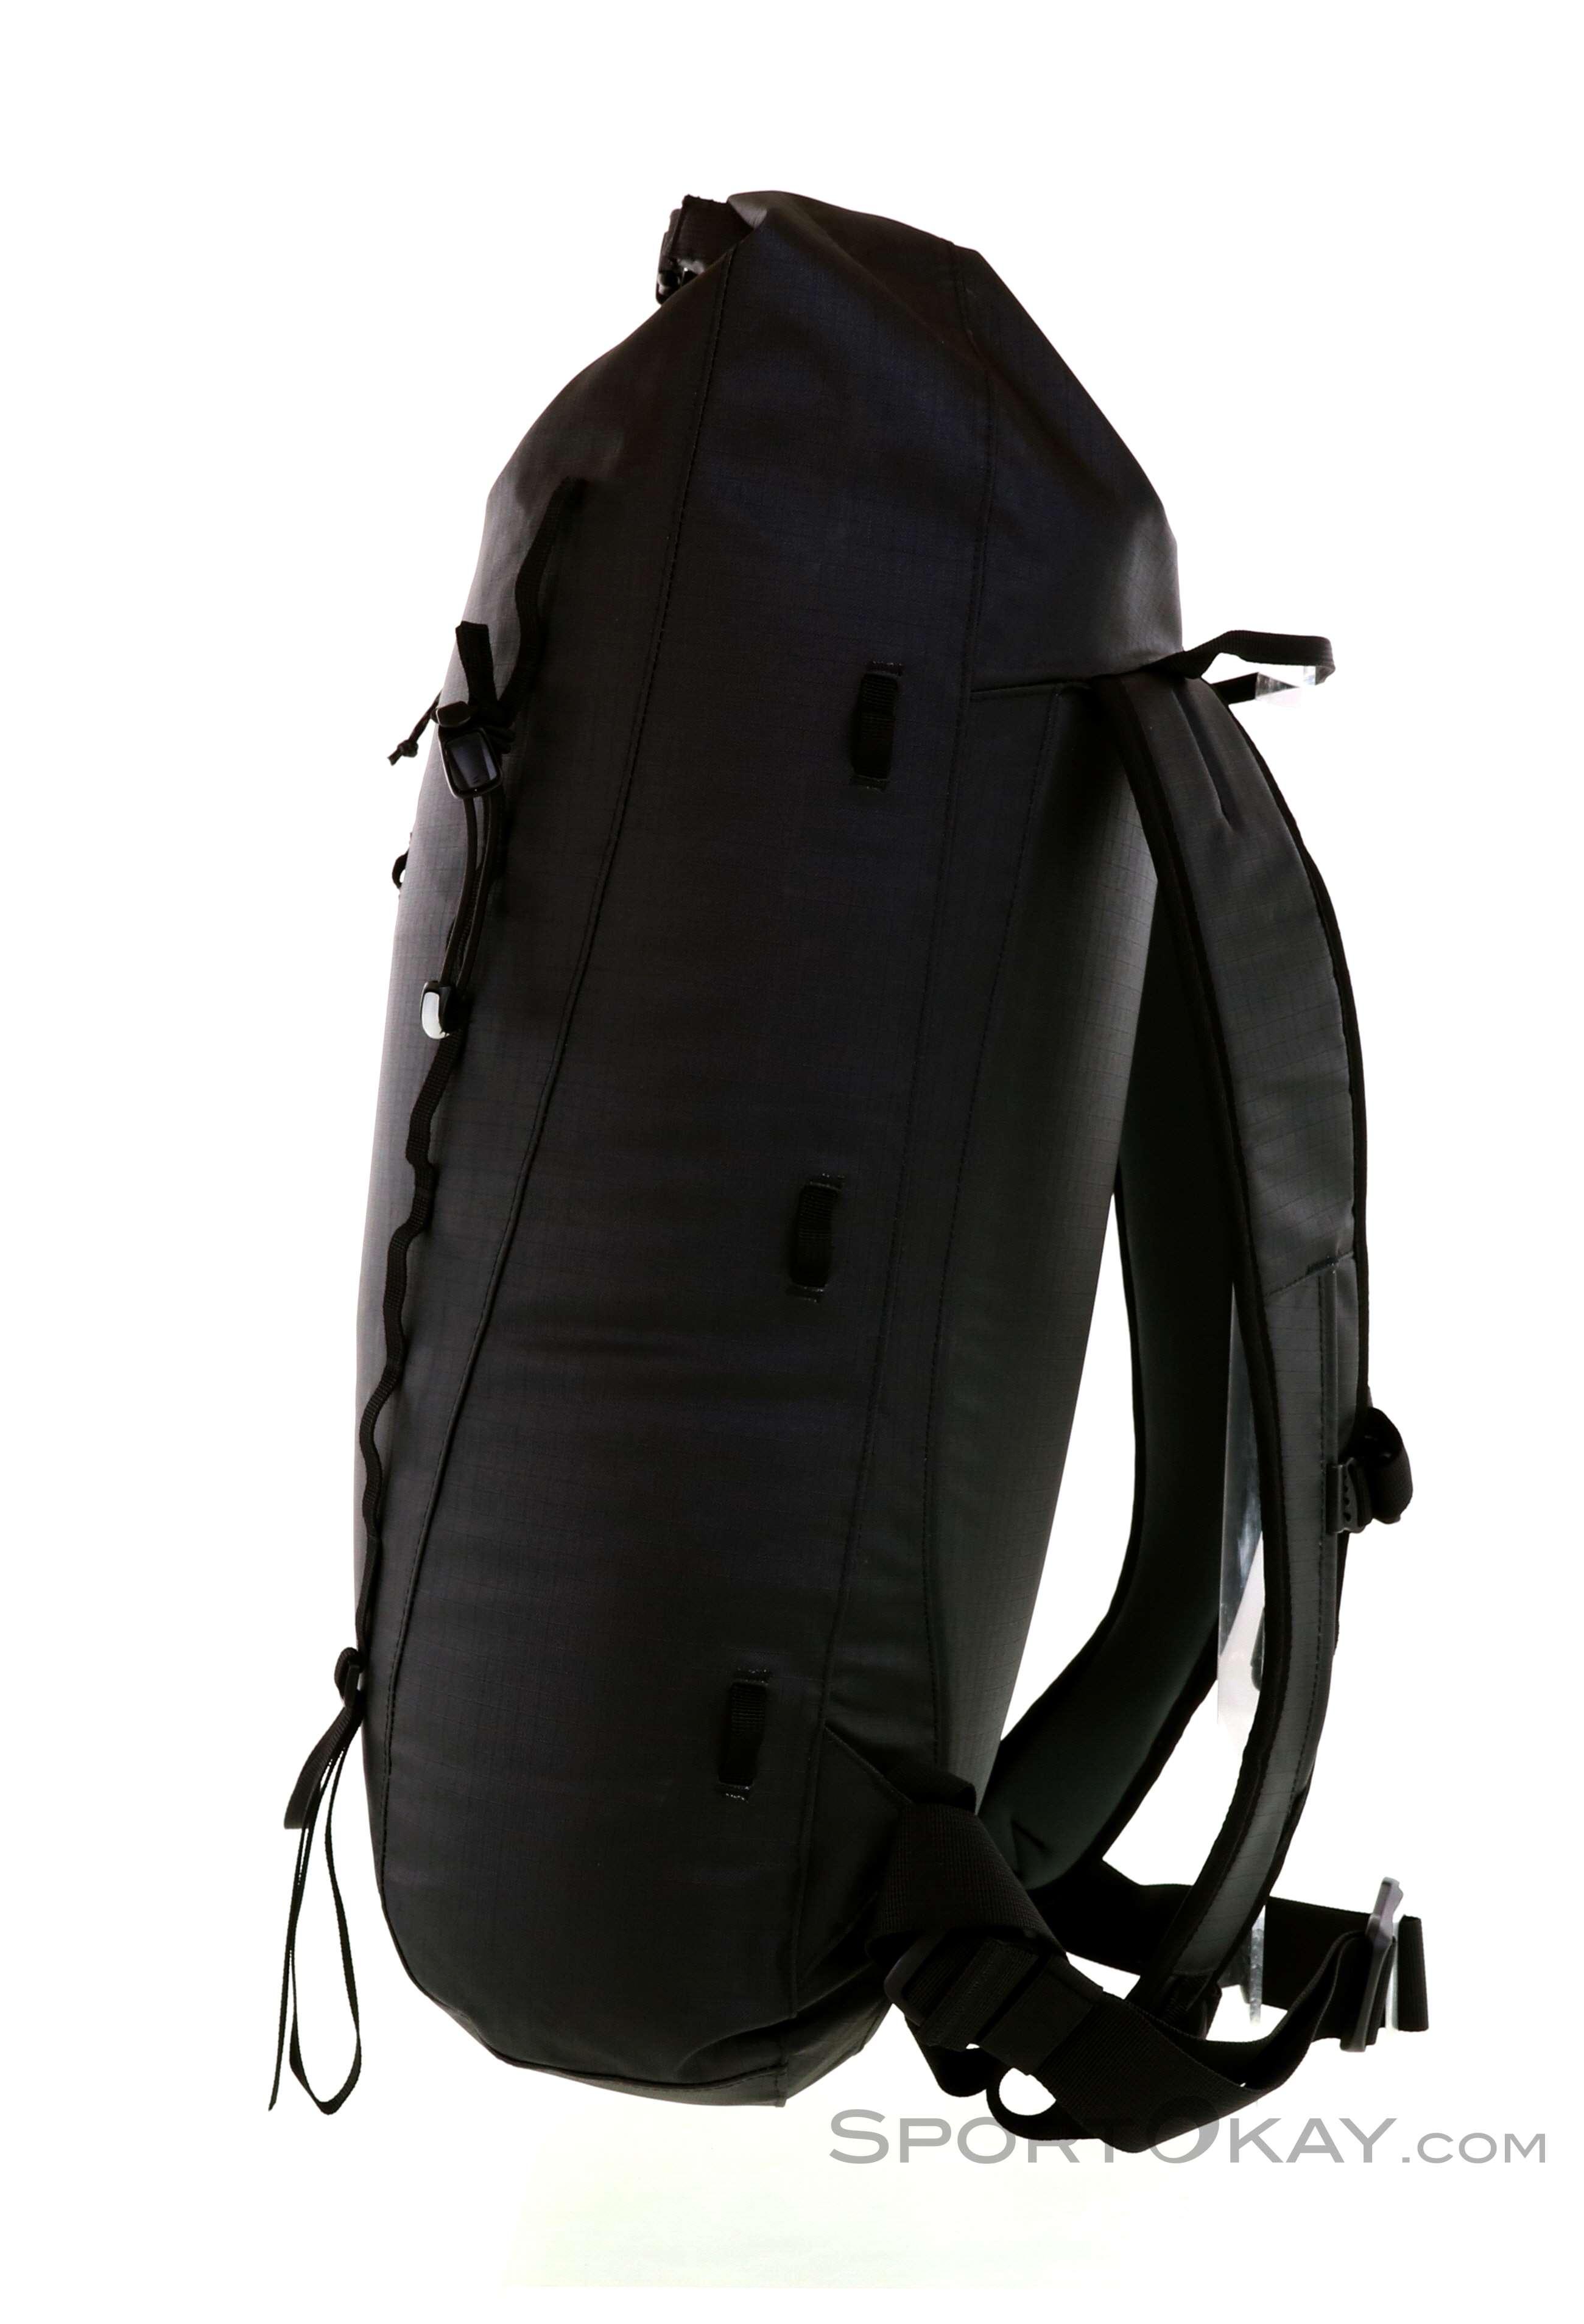 Exped Black Ice 30l Backpack Backpacks Backpacks